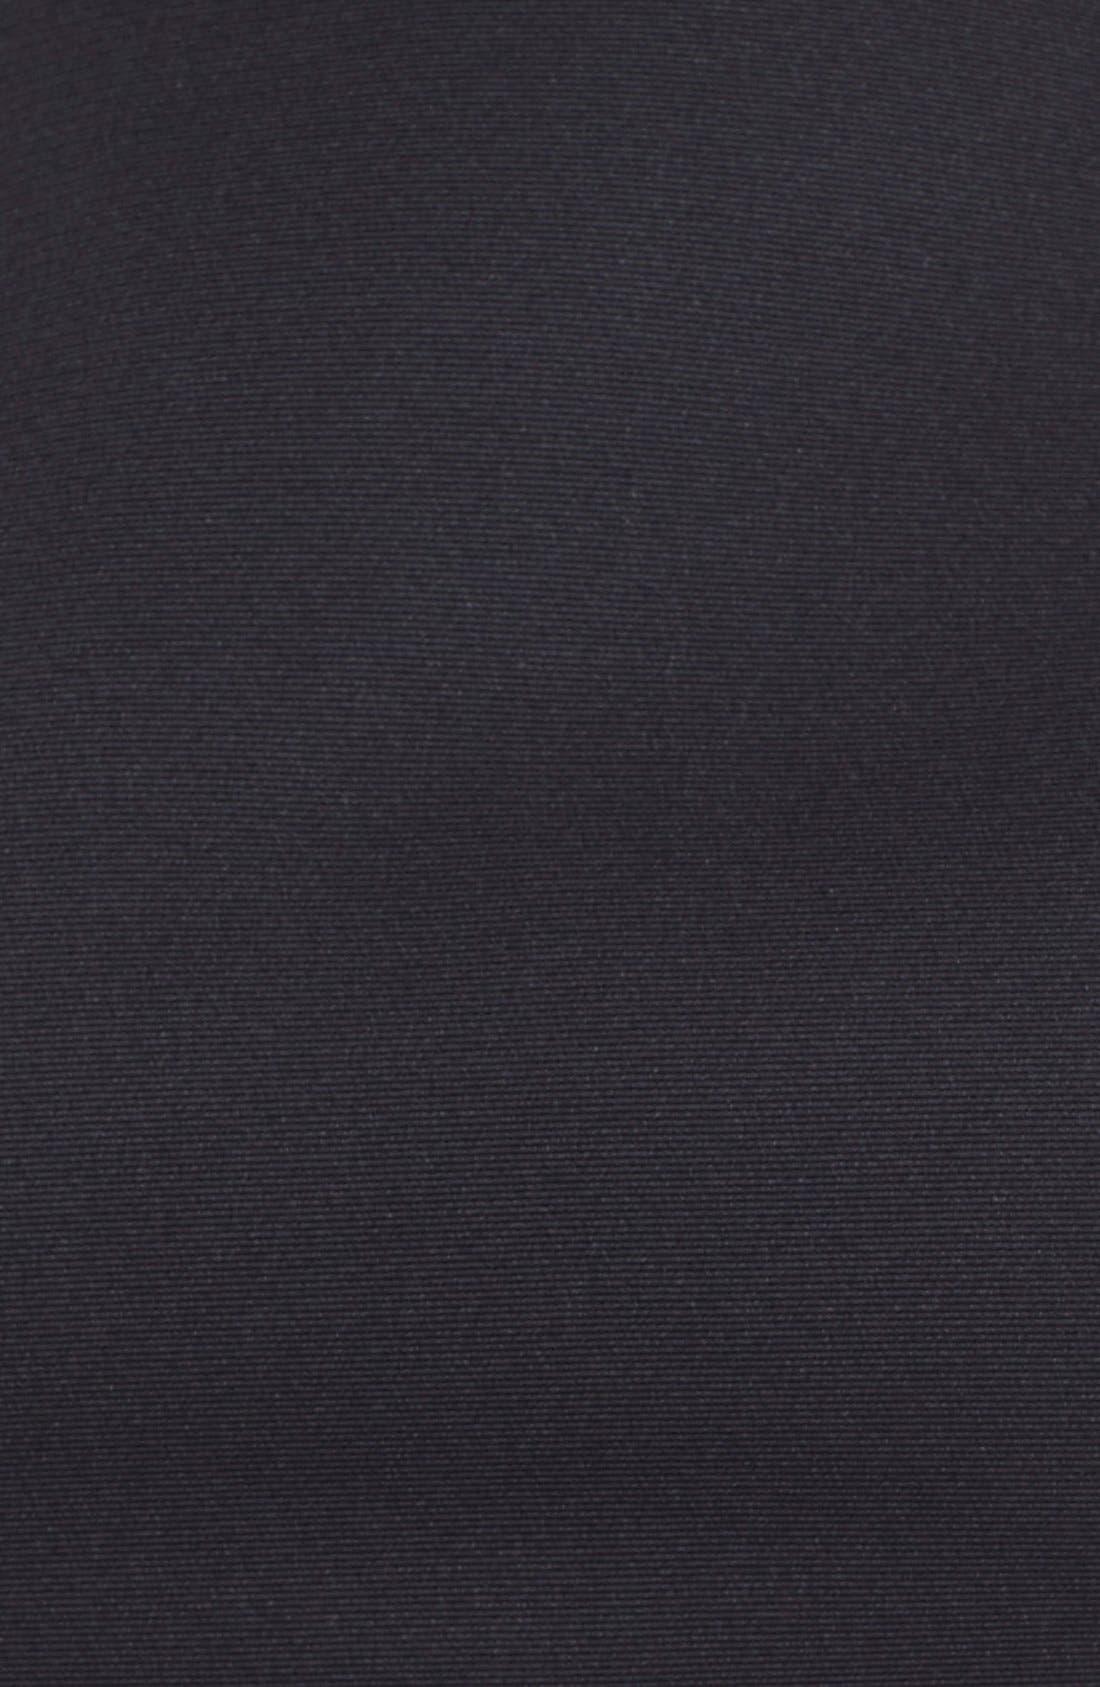 Alternate Image 5  - Halston Heritage Side Cutout Bateau Neck Satin Faille Fit & Flare Dress